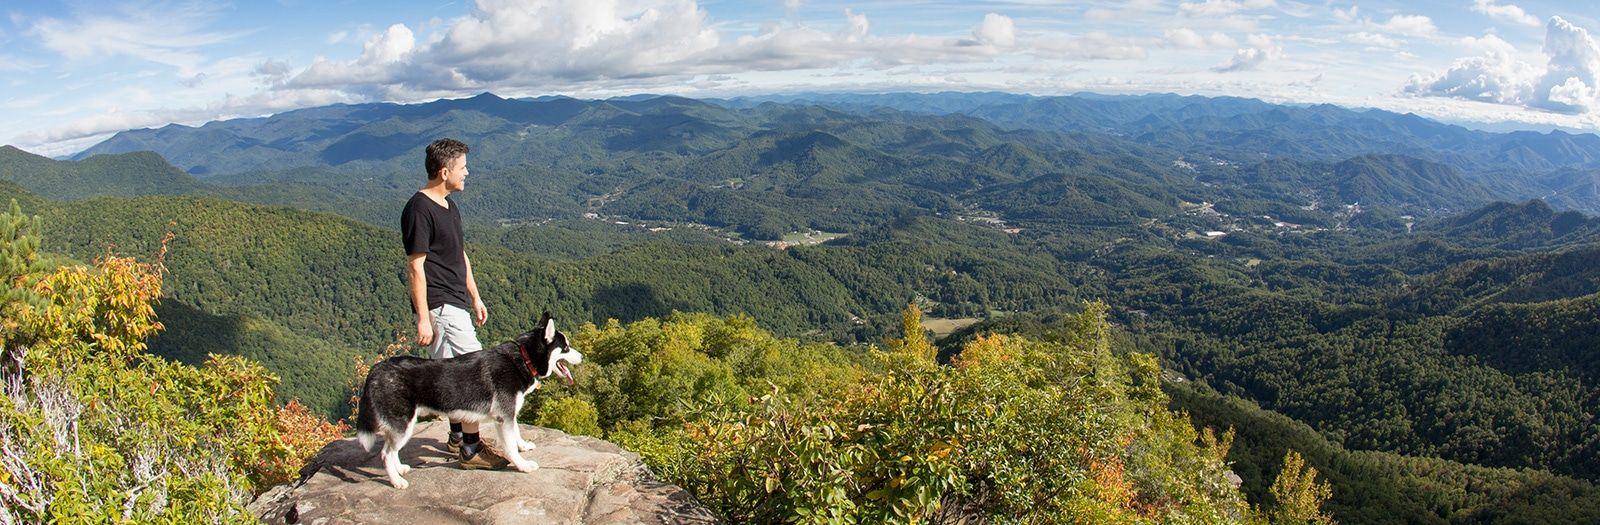 Pinnacle Park Trail Discover Jackson NC Park trails